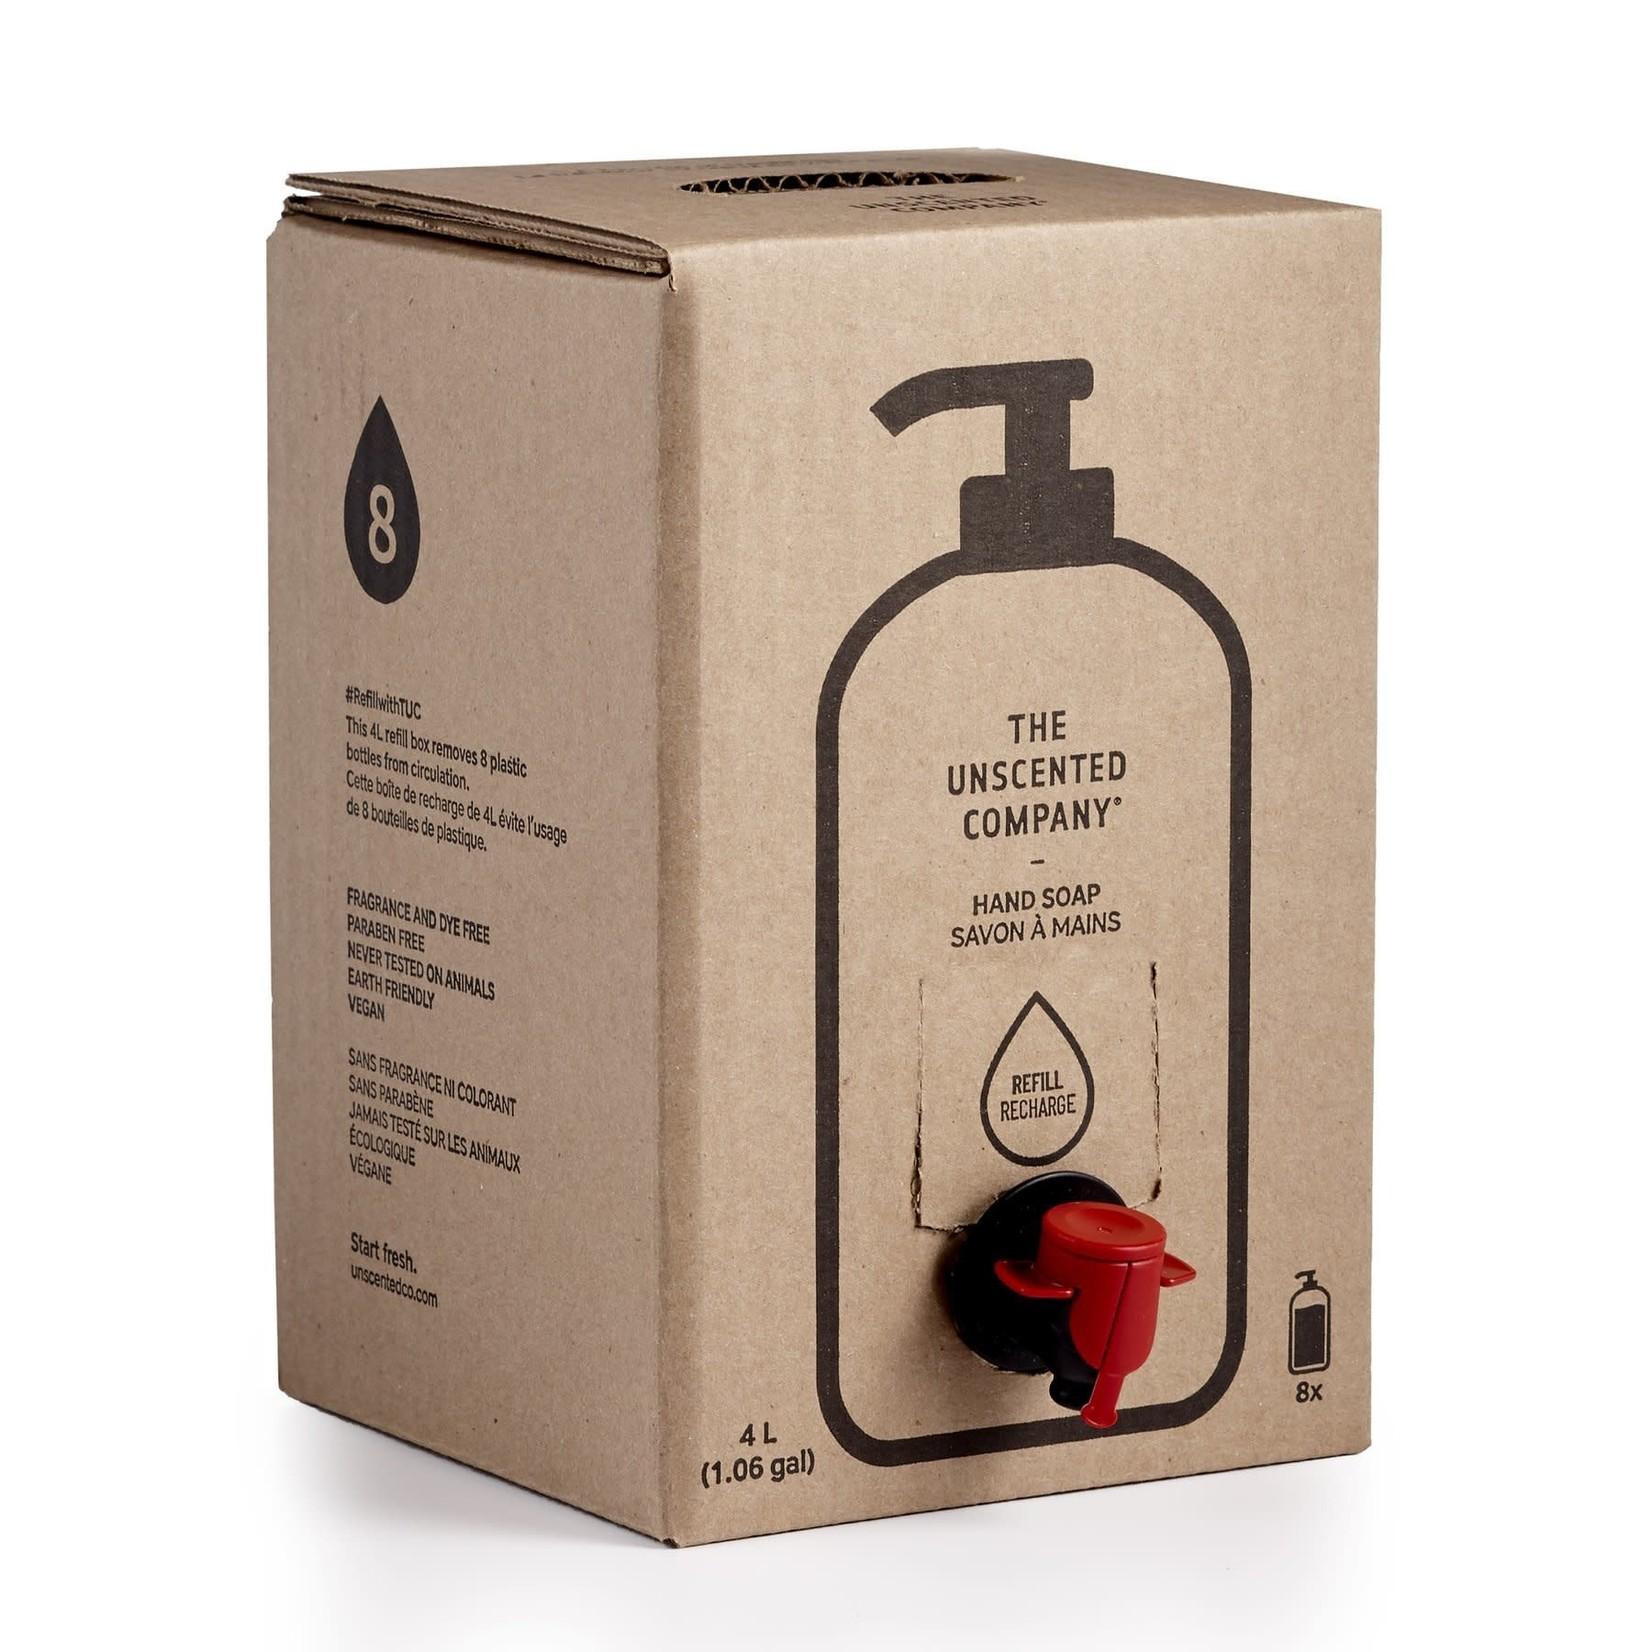 THE UNSCENTED COMPANY HAND SOAP - 4L REFILL BOX